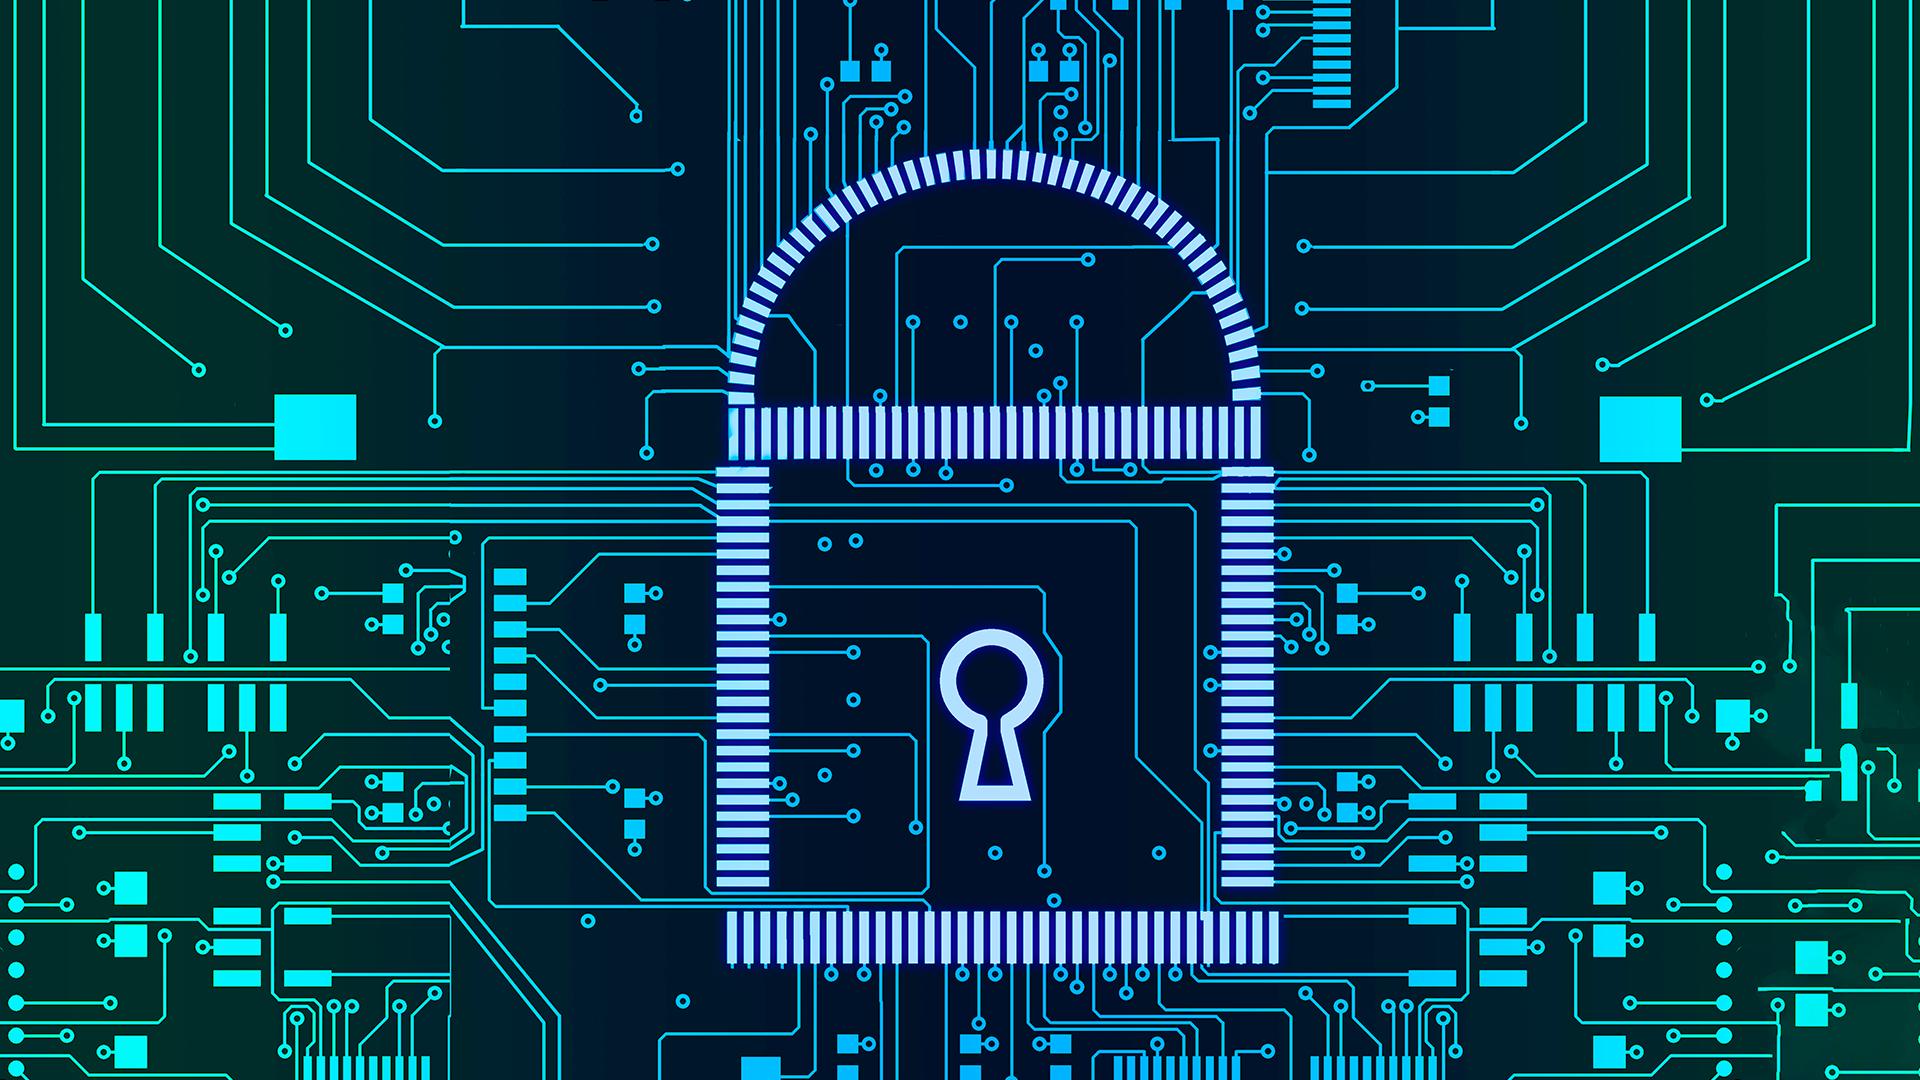 Nutanix report on infrastructure security